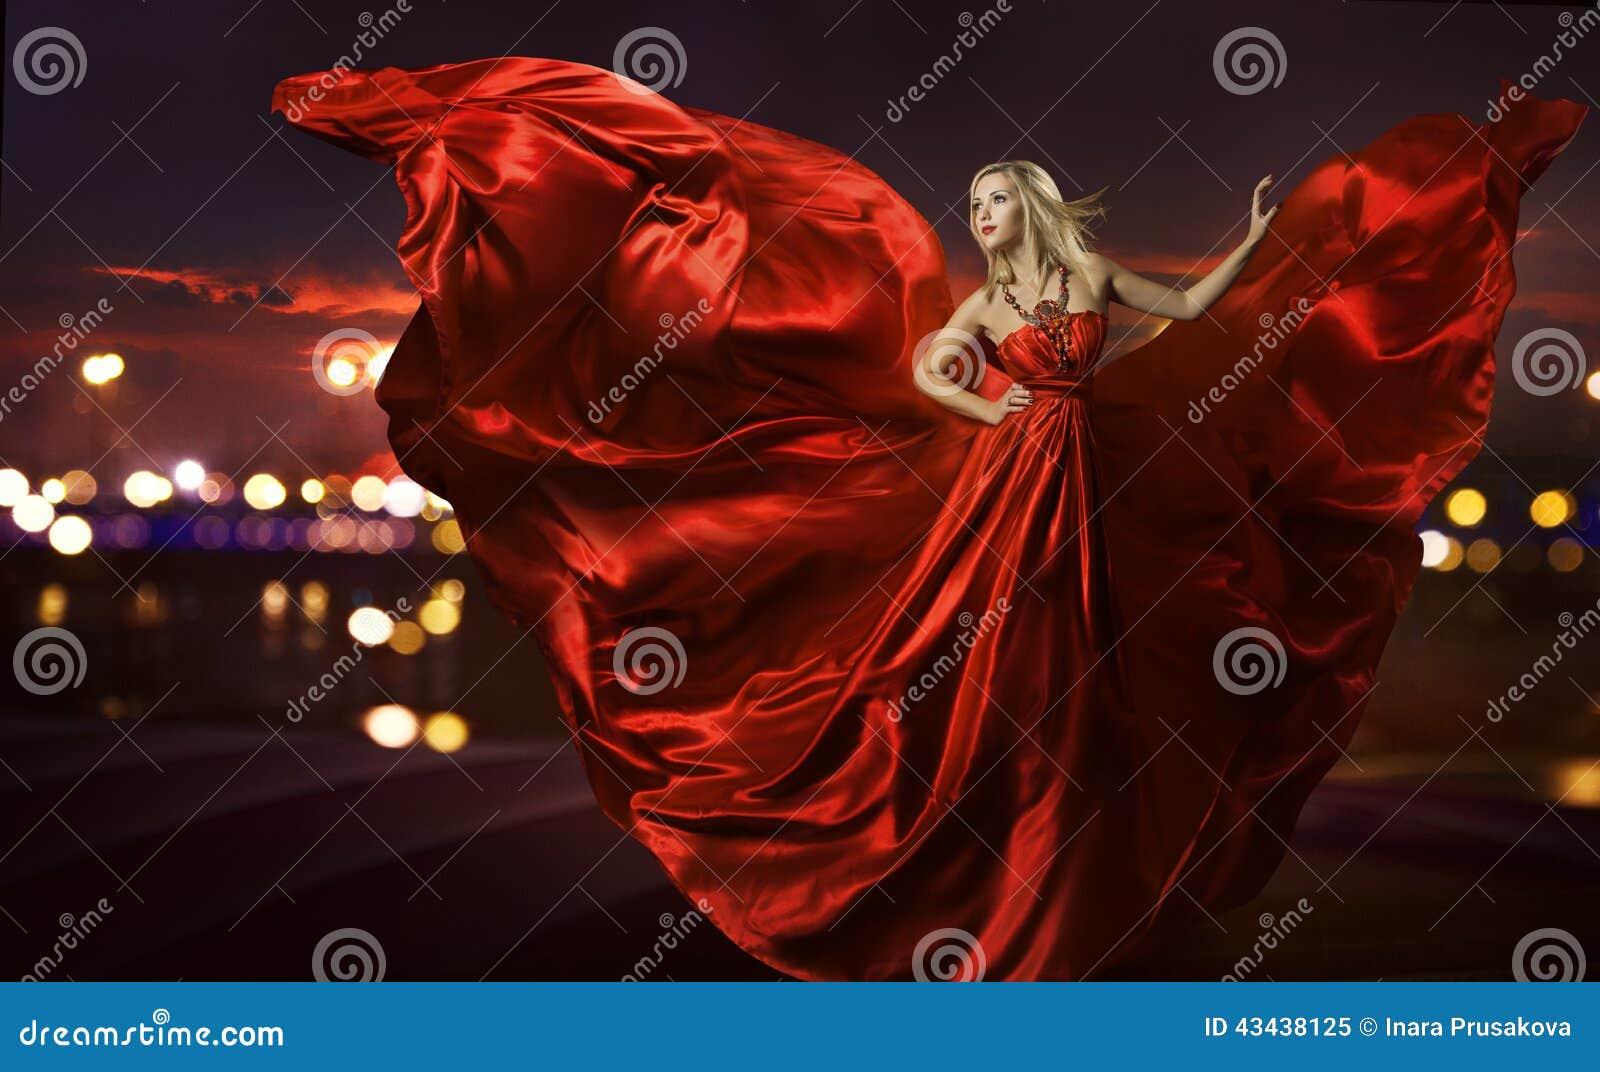 Woman dancing in silk dress, artistic red blowing